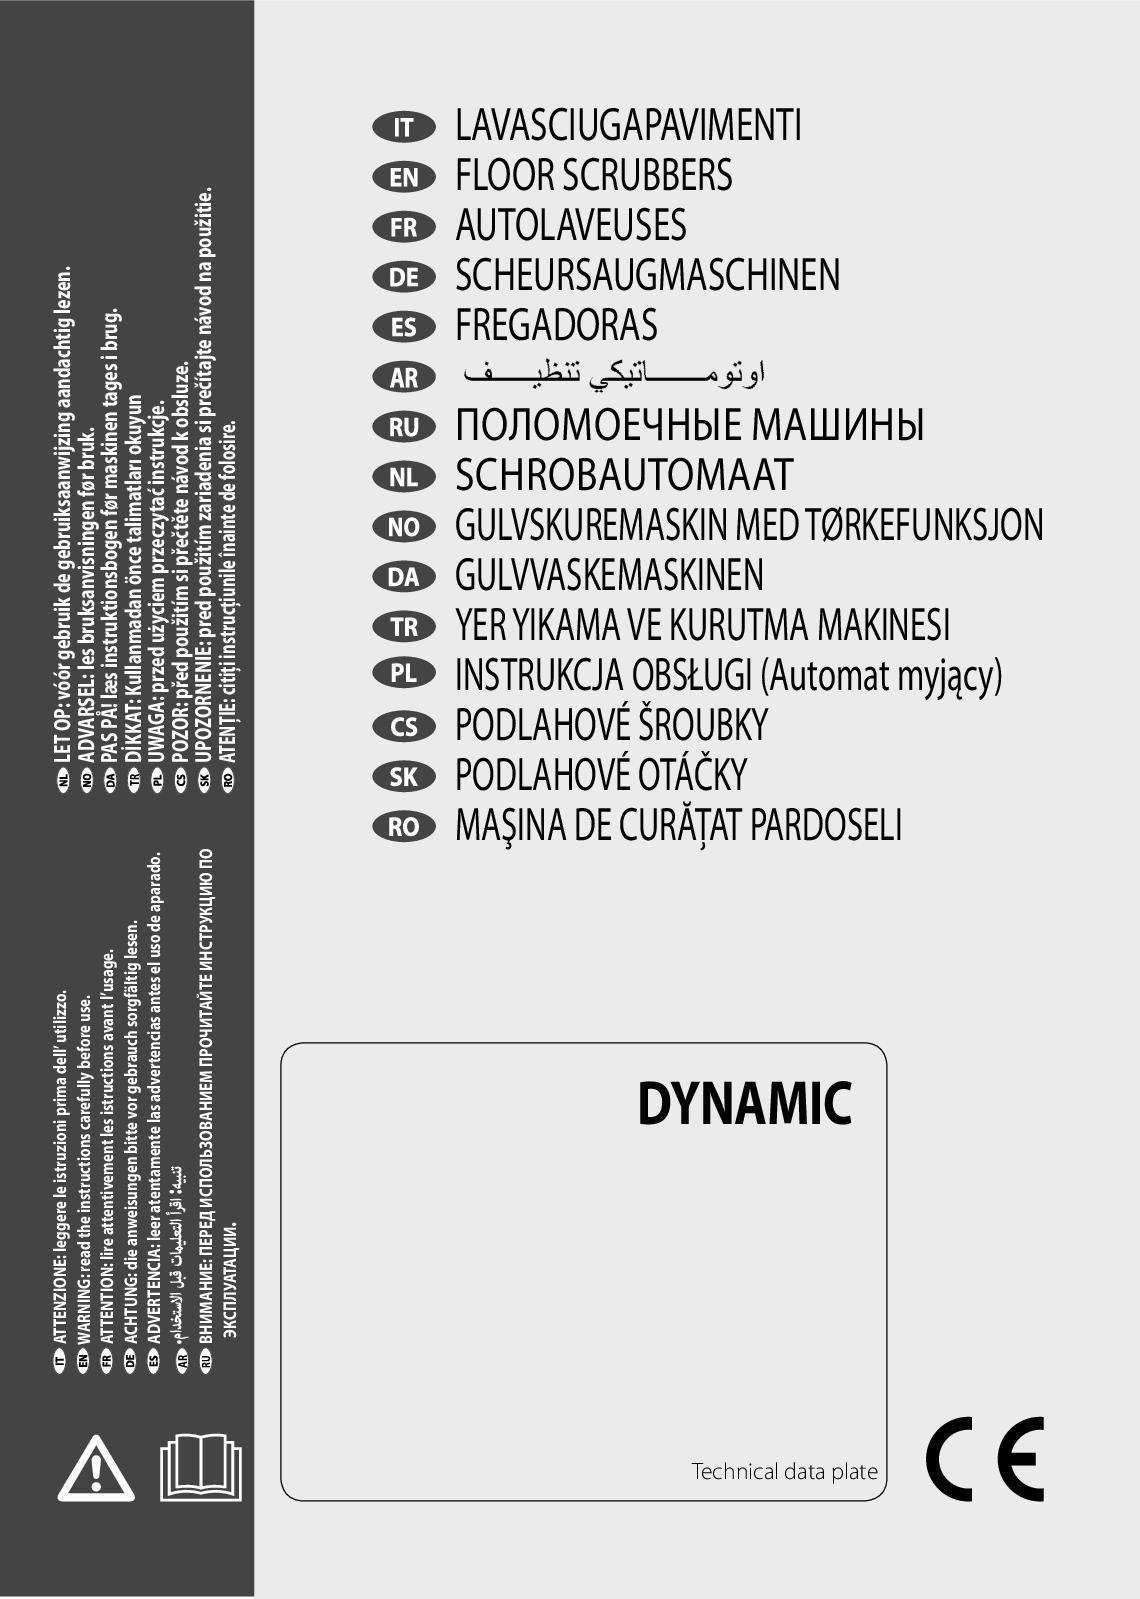 Calaméo - MANUALE A4.pdf 6db829a6f25